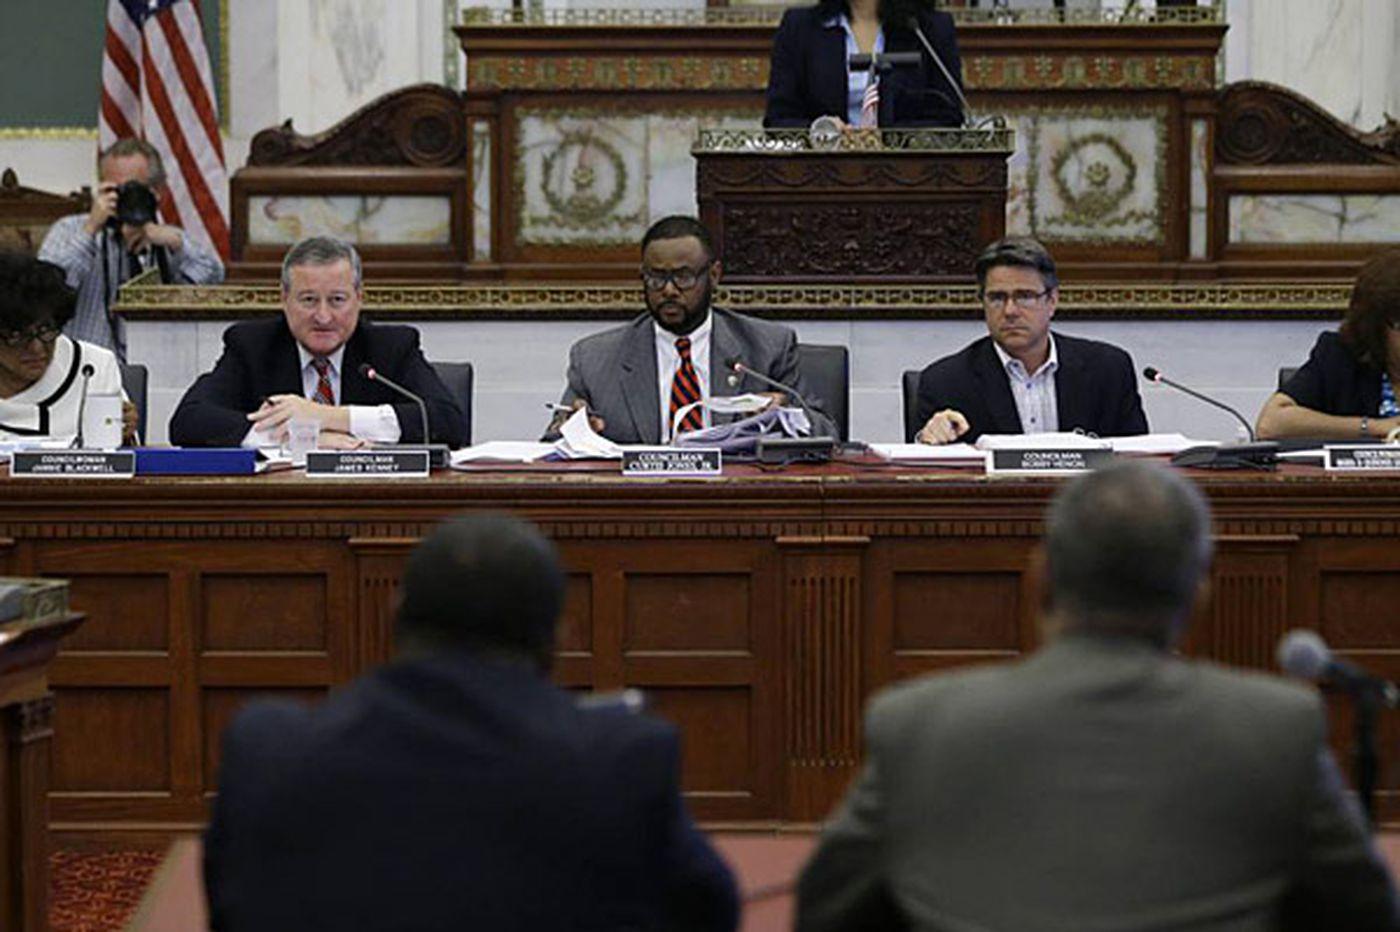 Council members spar over community development regulations